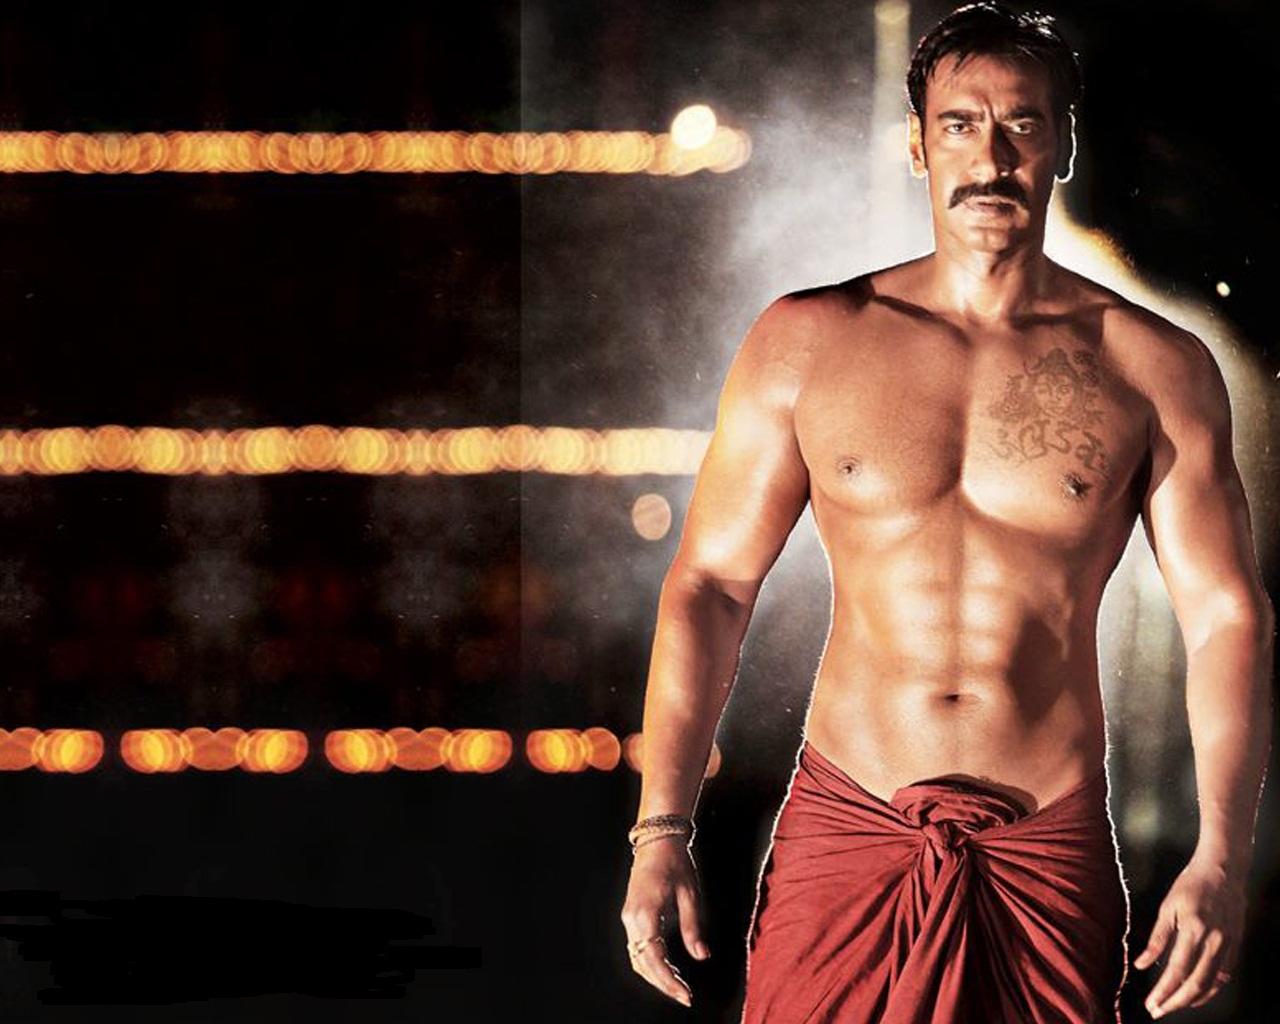 Ajay devgan hot body hd pics in new movie shirtless photo free ajay devgan hot body hd pics in new movie shirtless photo free altavistaventures Images